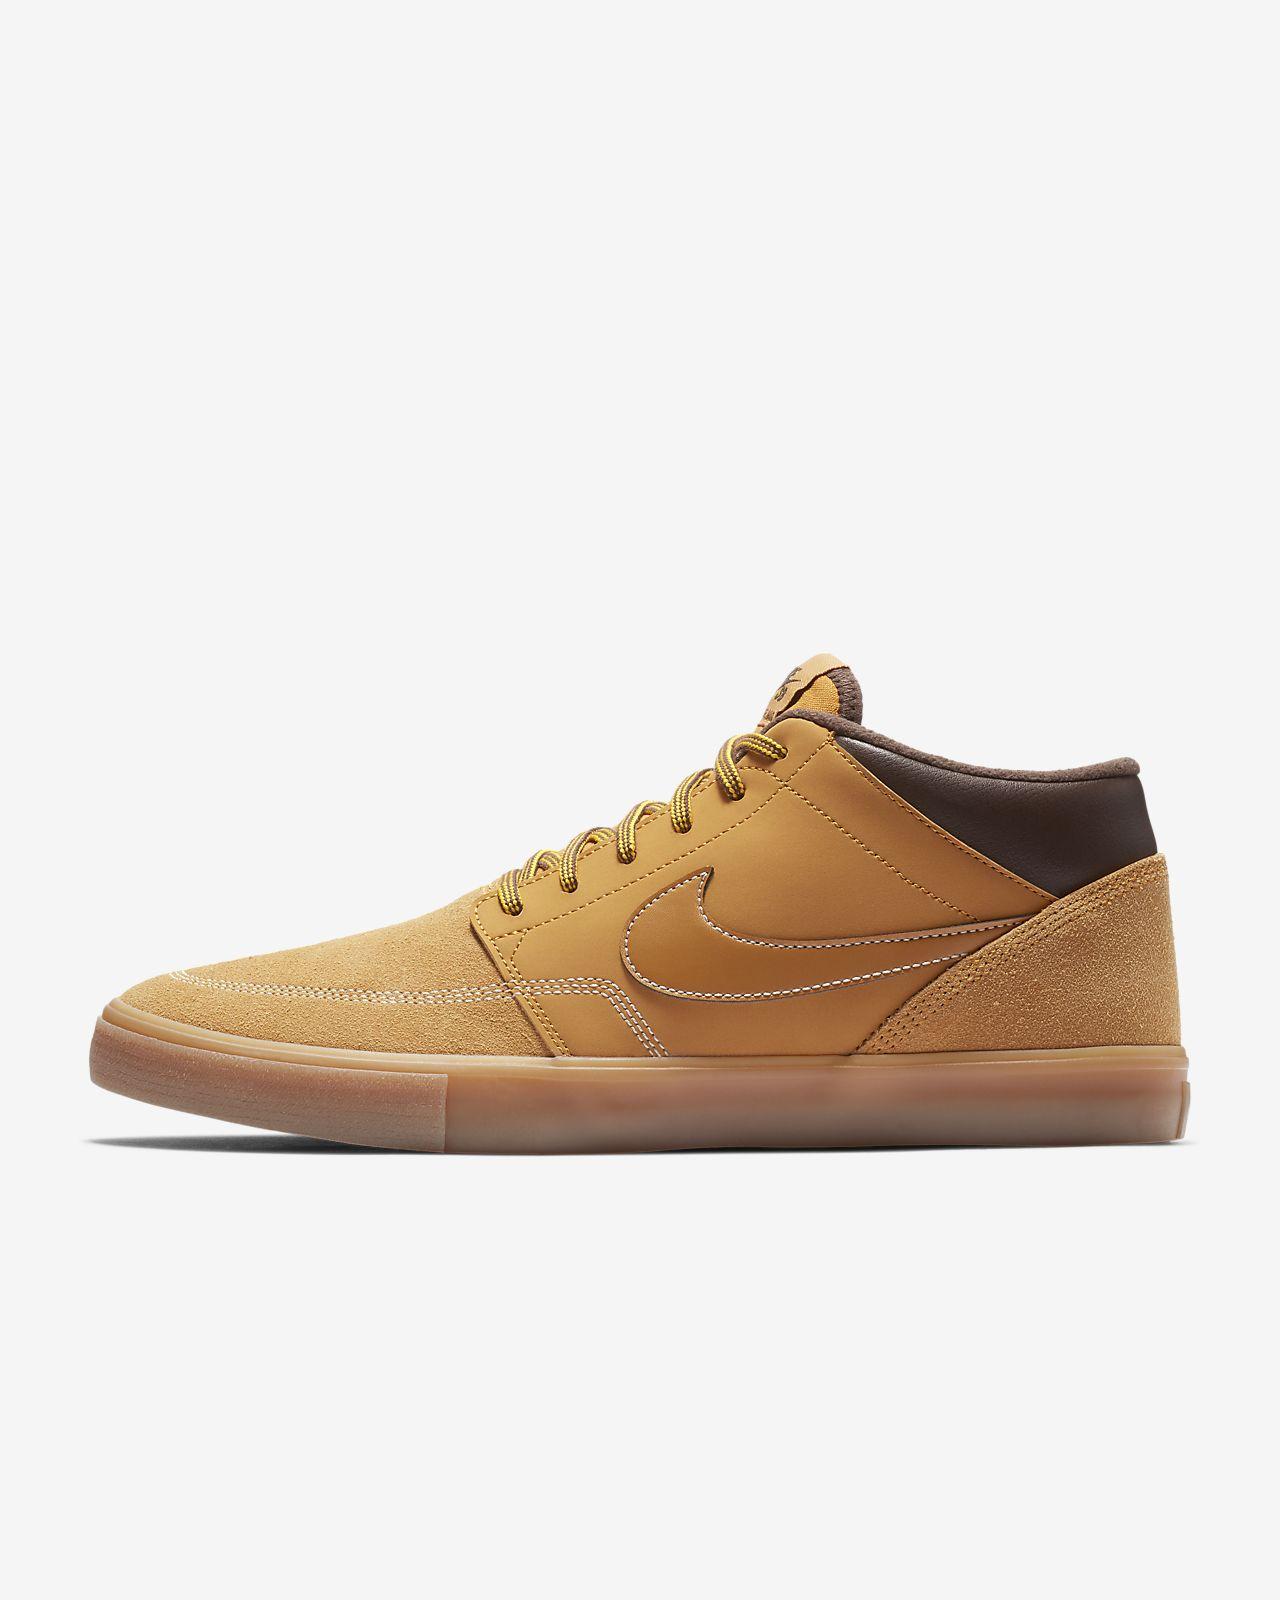 release date c7a53 5ef40 ... Calzado de skateboarding Nike SB Portmore II Solarsoft Mid Bota